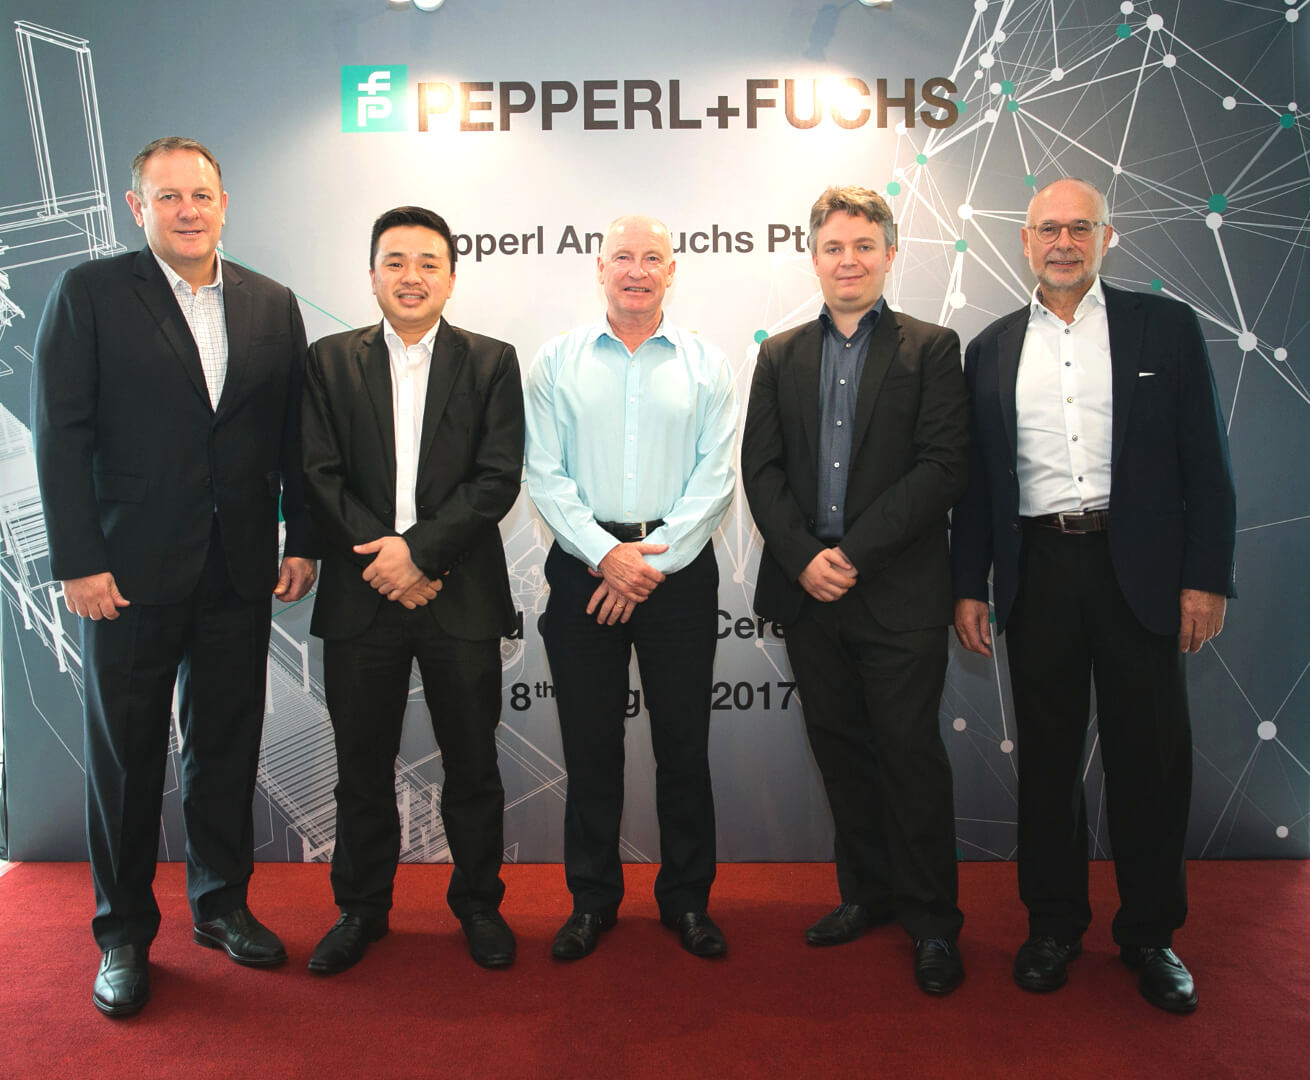 Inauguration, Pepperl+Fuchs, sales office, Petaling Jaya, Selangor, Malaysia, Matthias Gunkel, Shane Parr, Steven Lim, Simon Sumner, Bryan McHutchison